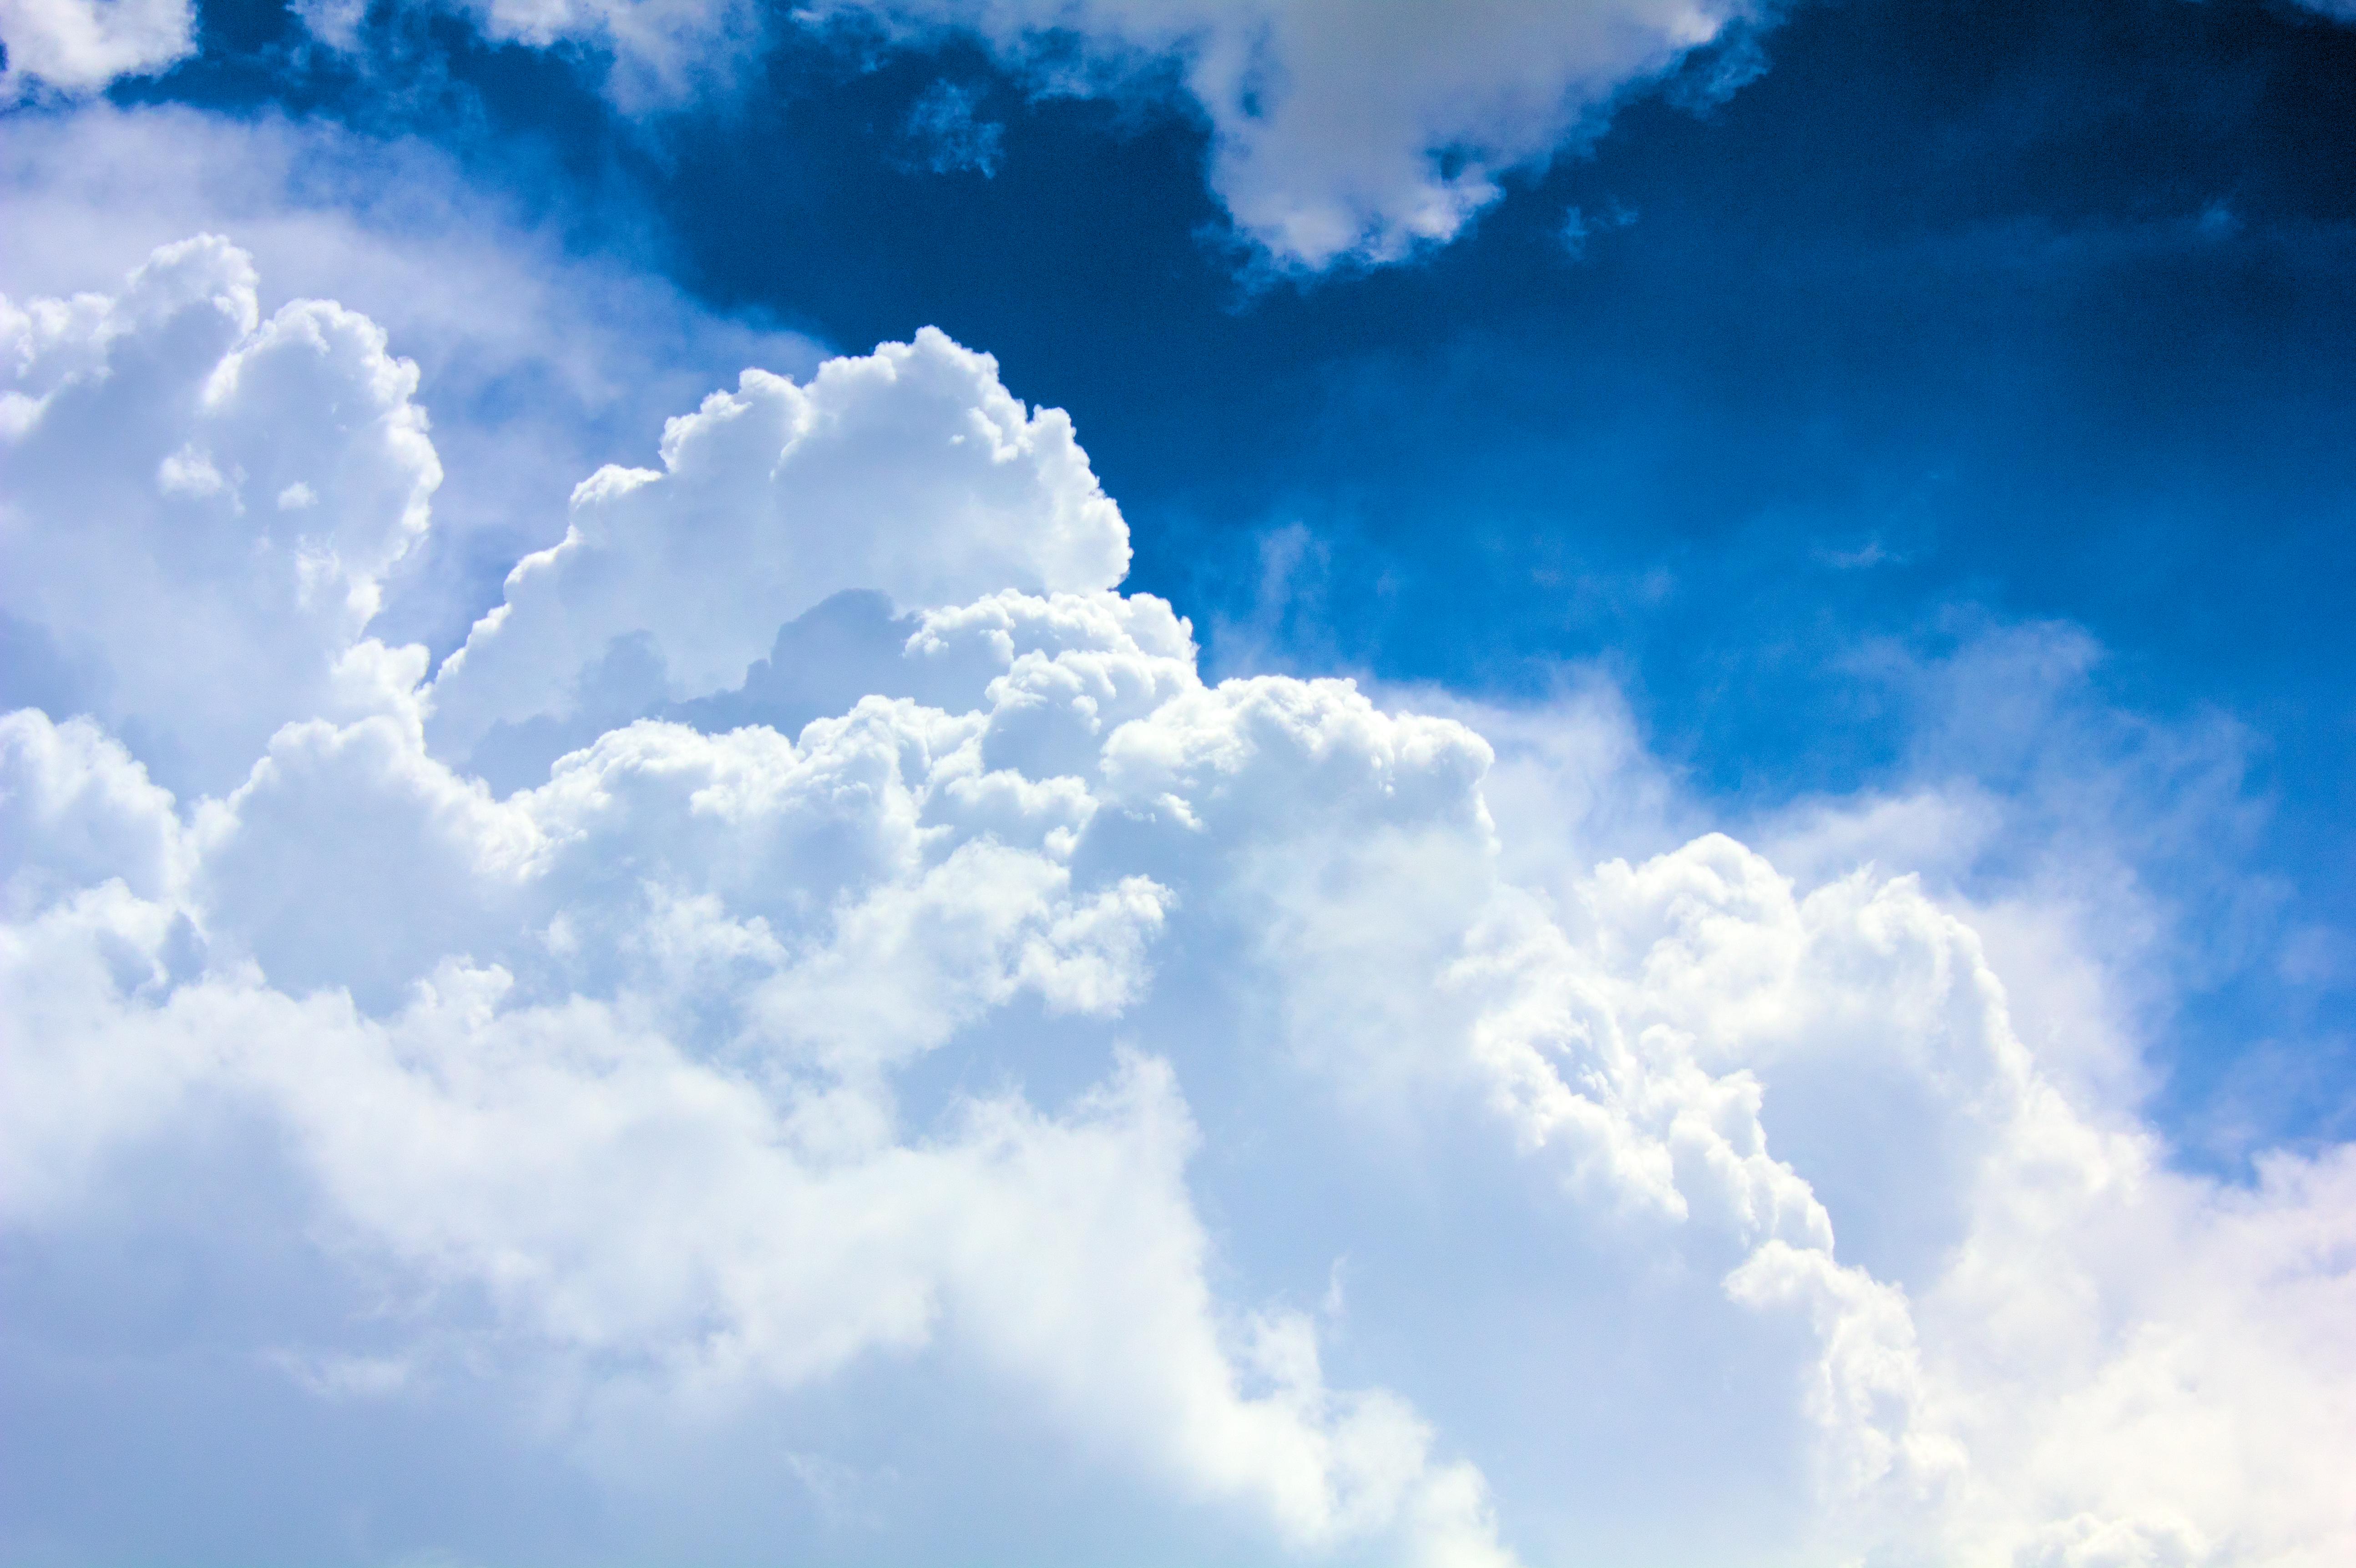 Clouds Beyond Clouds II by FnKlinedinst on DeviantArt